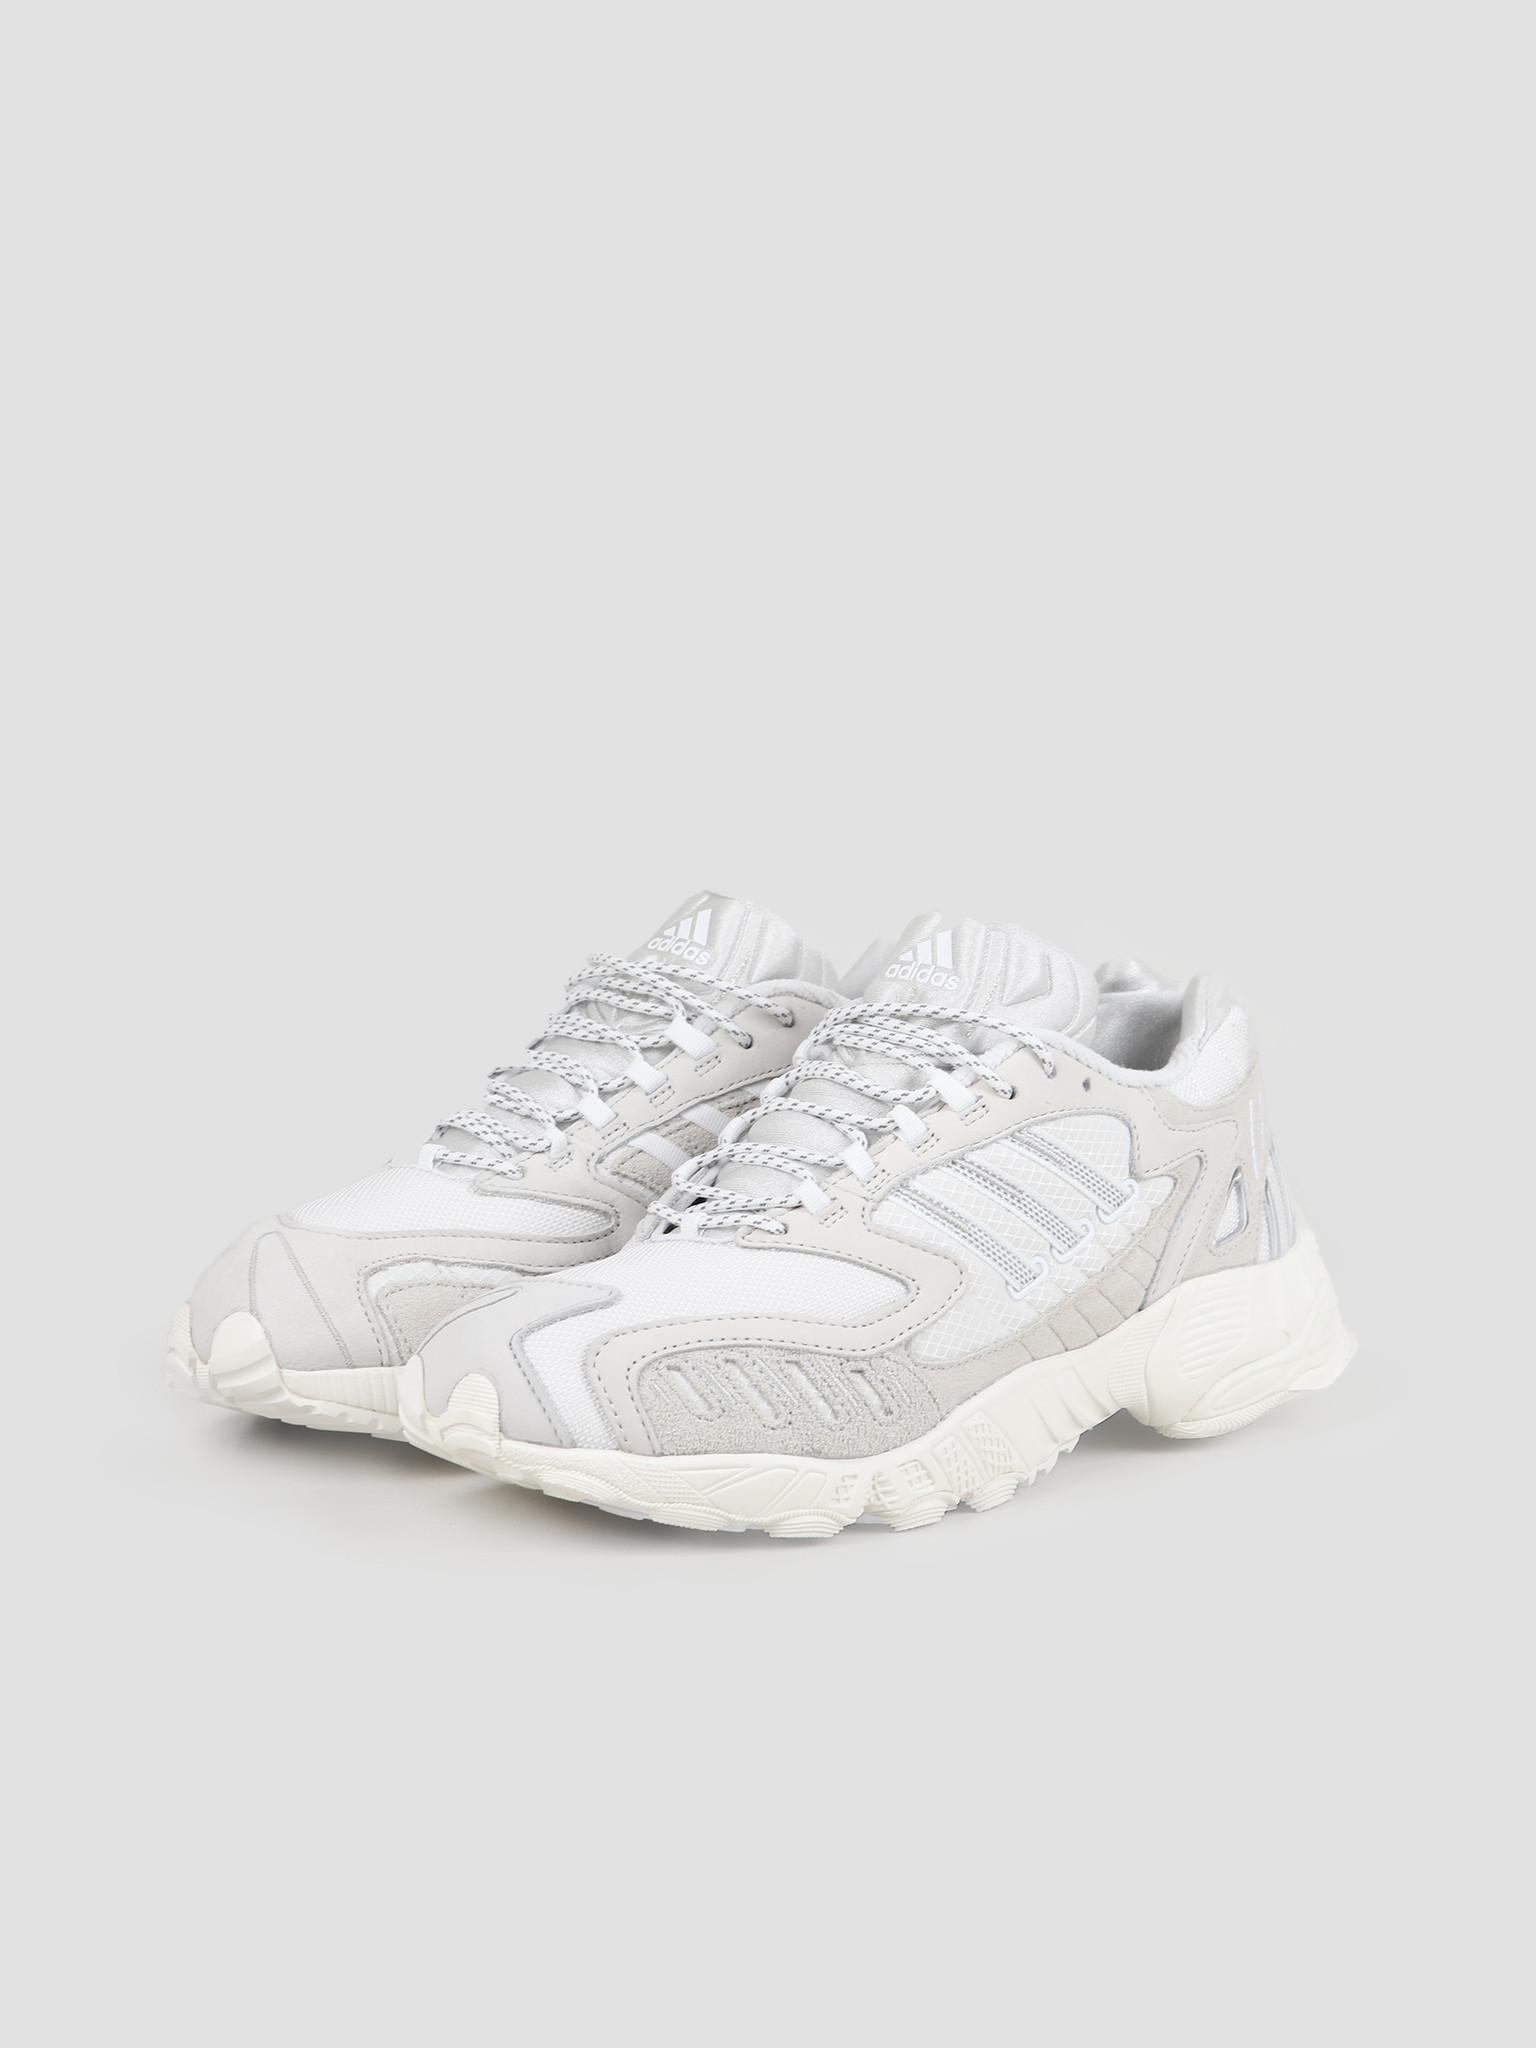 adidas adidas Torsion Trdc Crystal White Footwear White EH1550